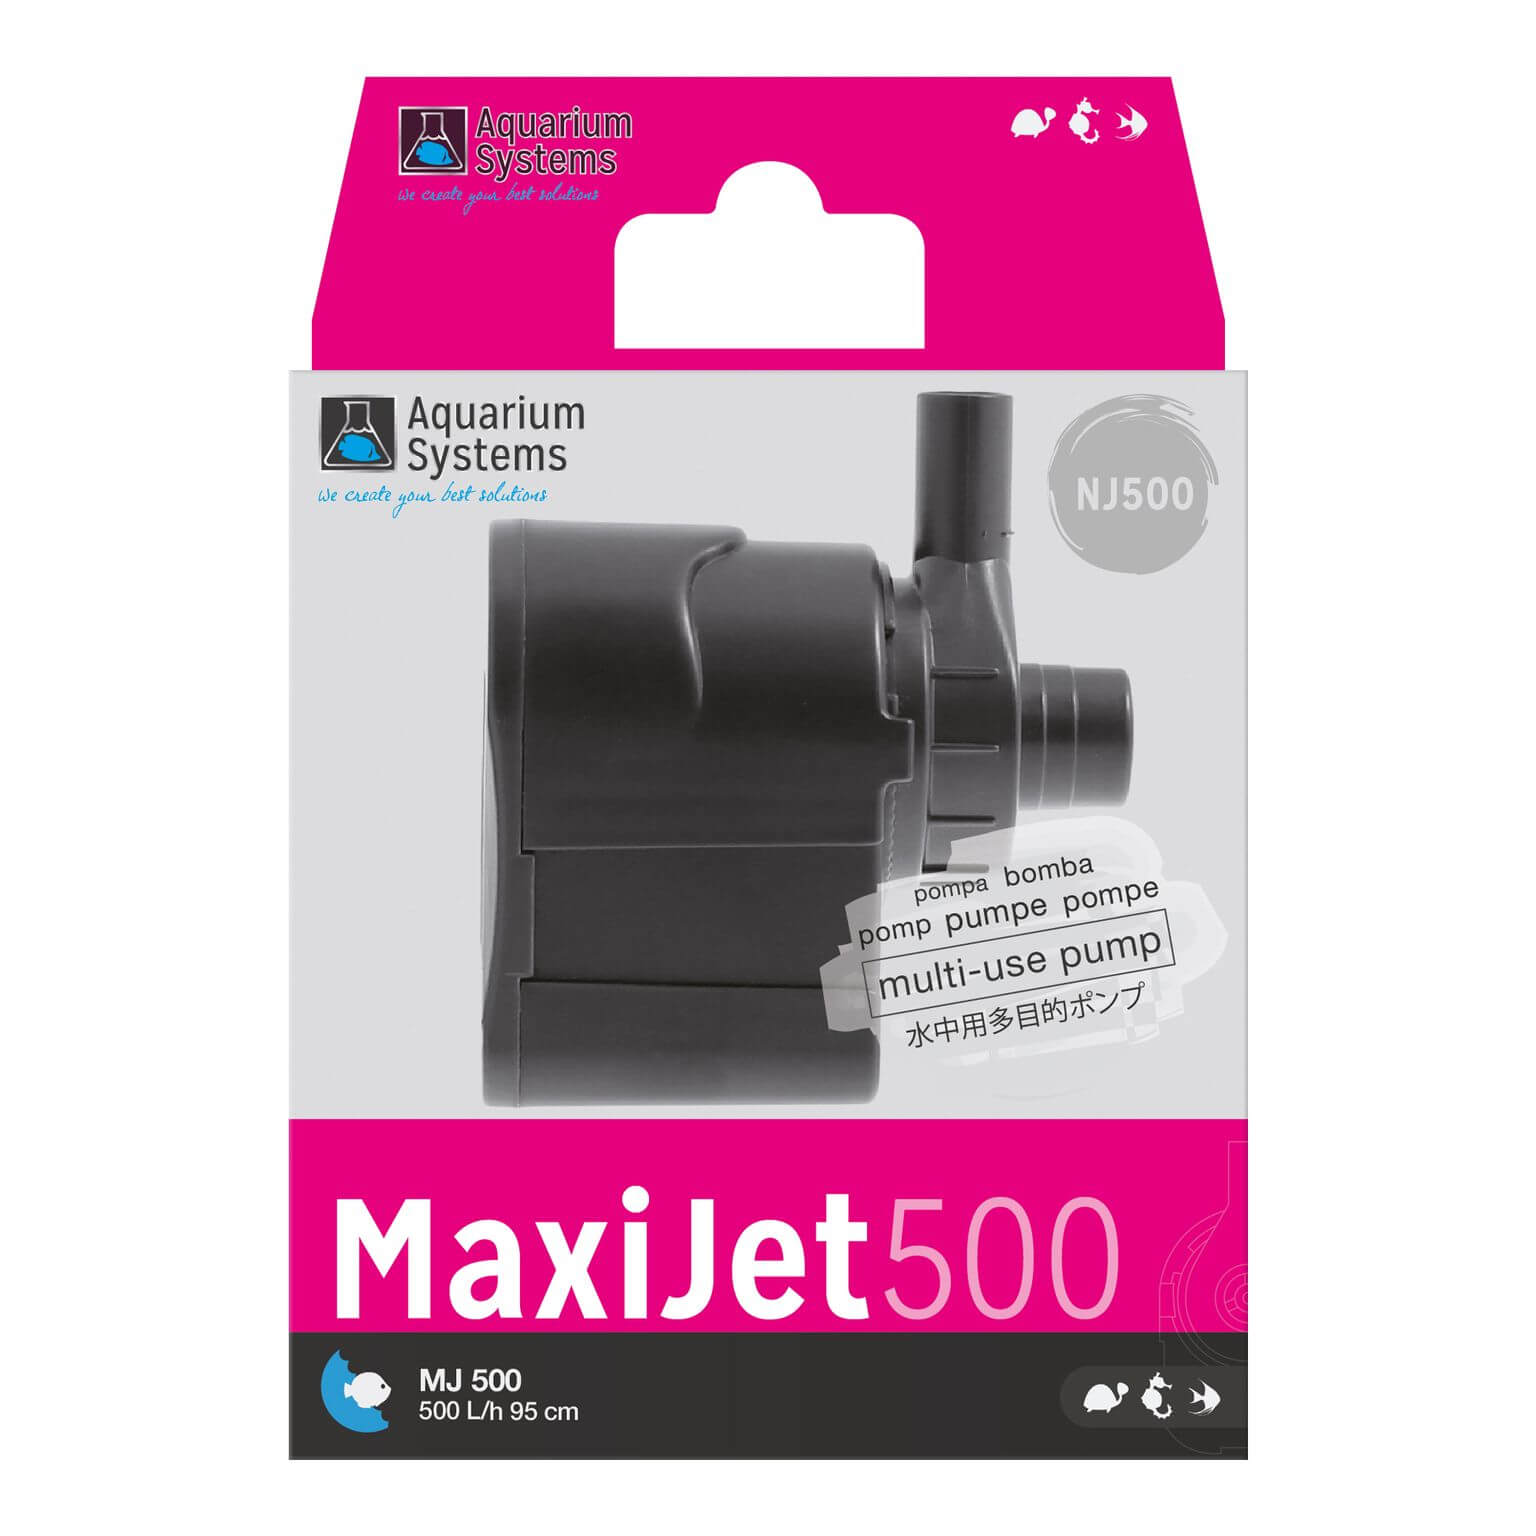 MAXIJET 500